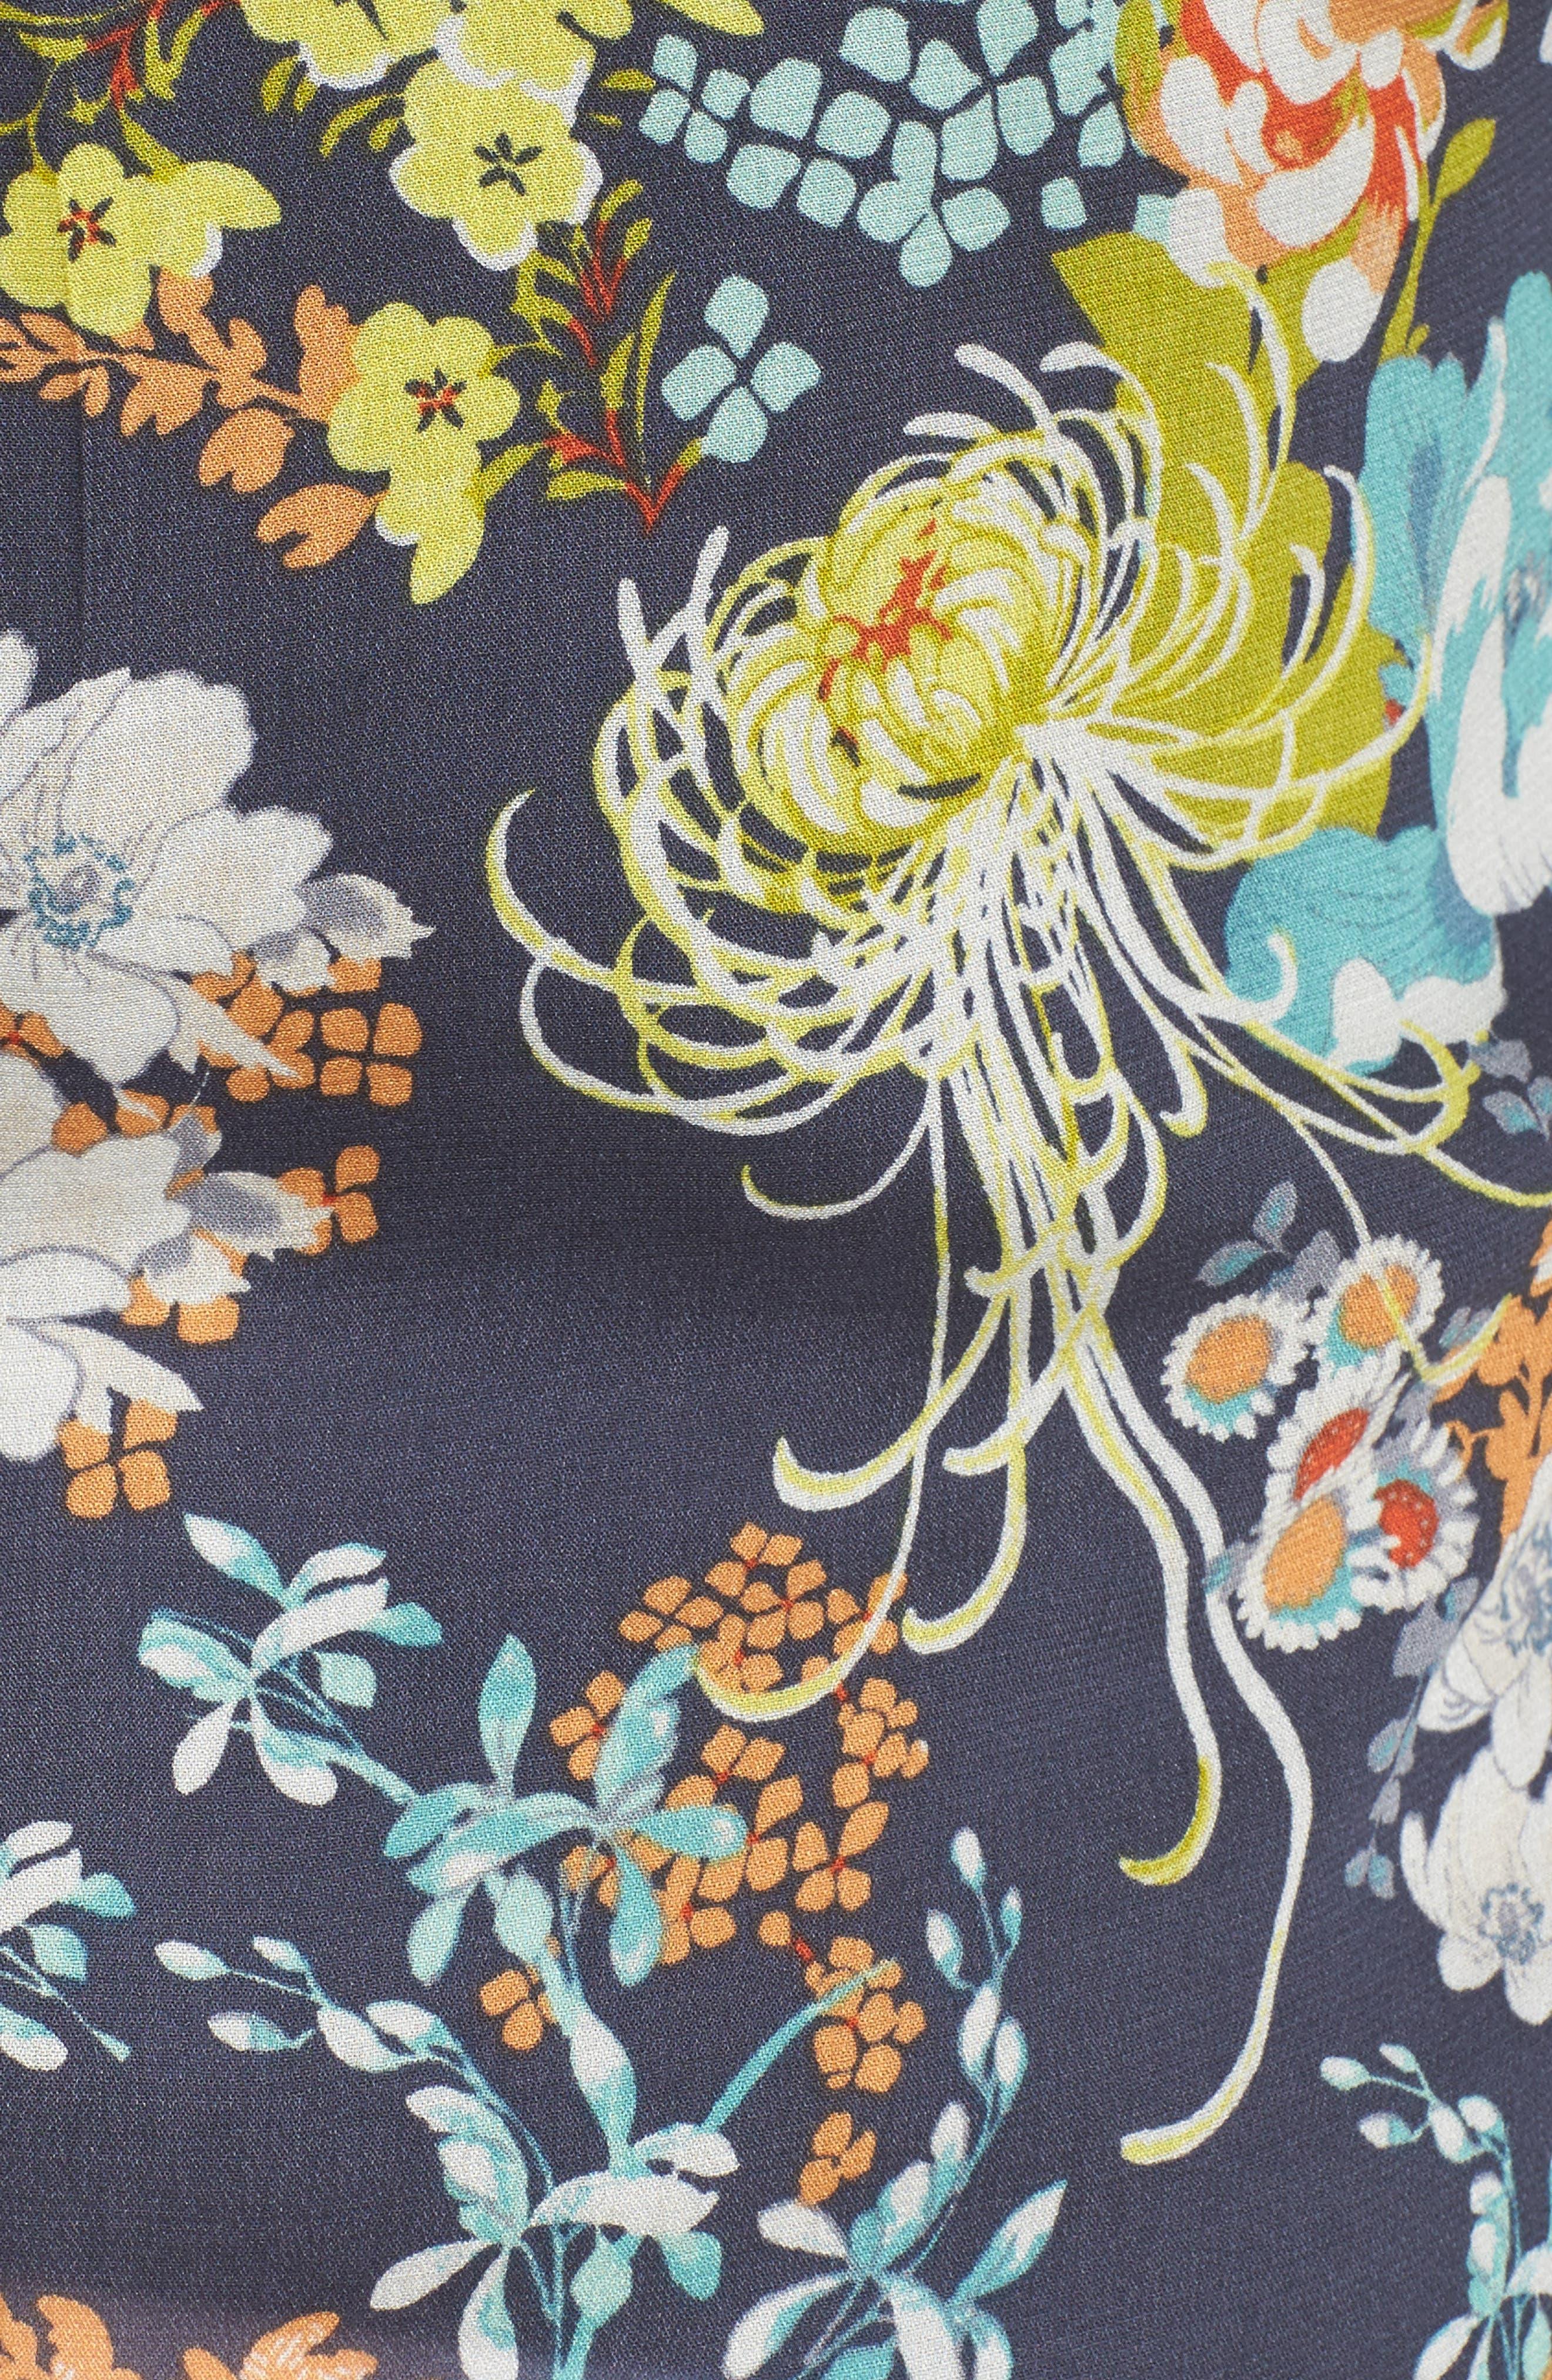 Floral Top,                             Alternate thumbnail 5, color,                             C950n Navy